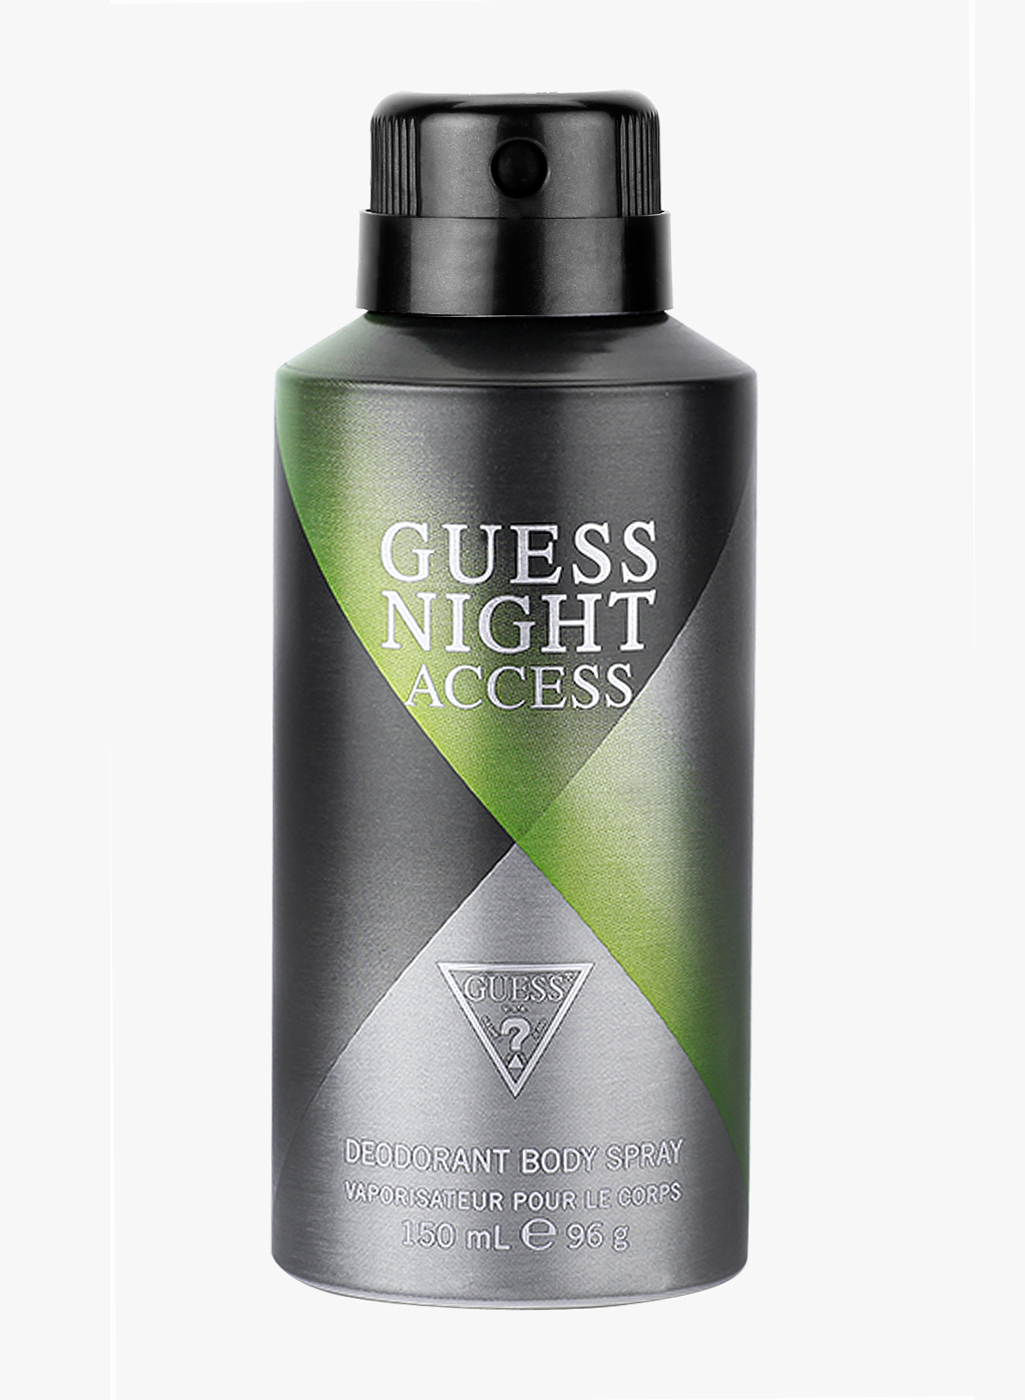 GUESS | Night Access Deodorant Spray 96Gm